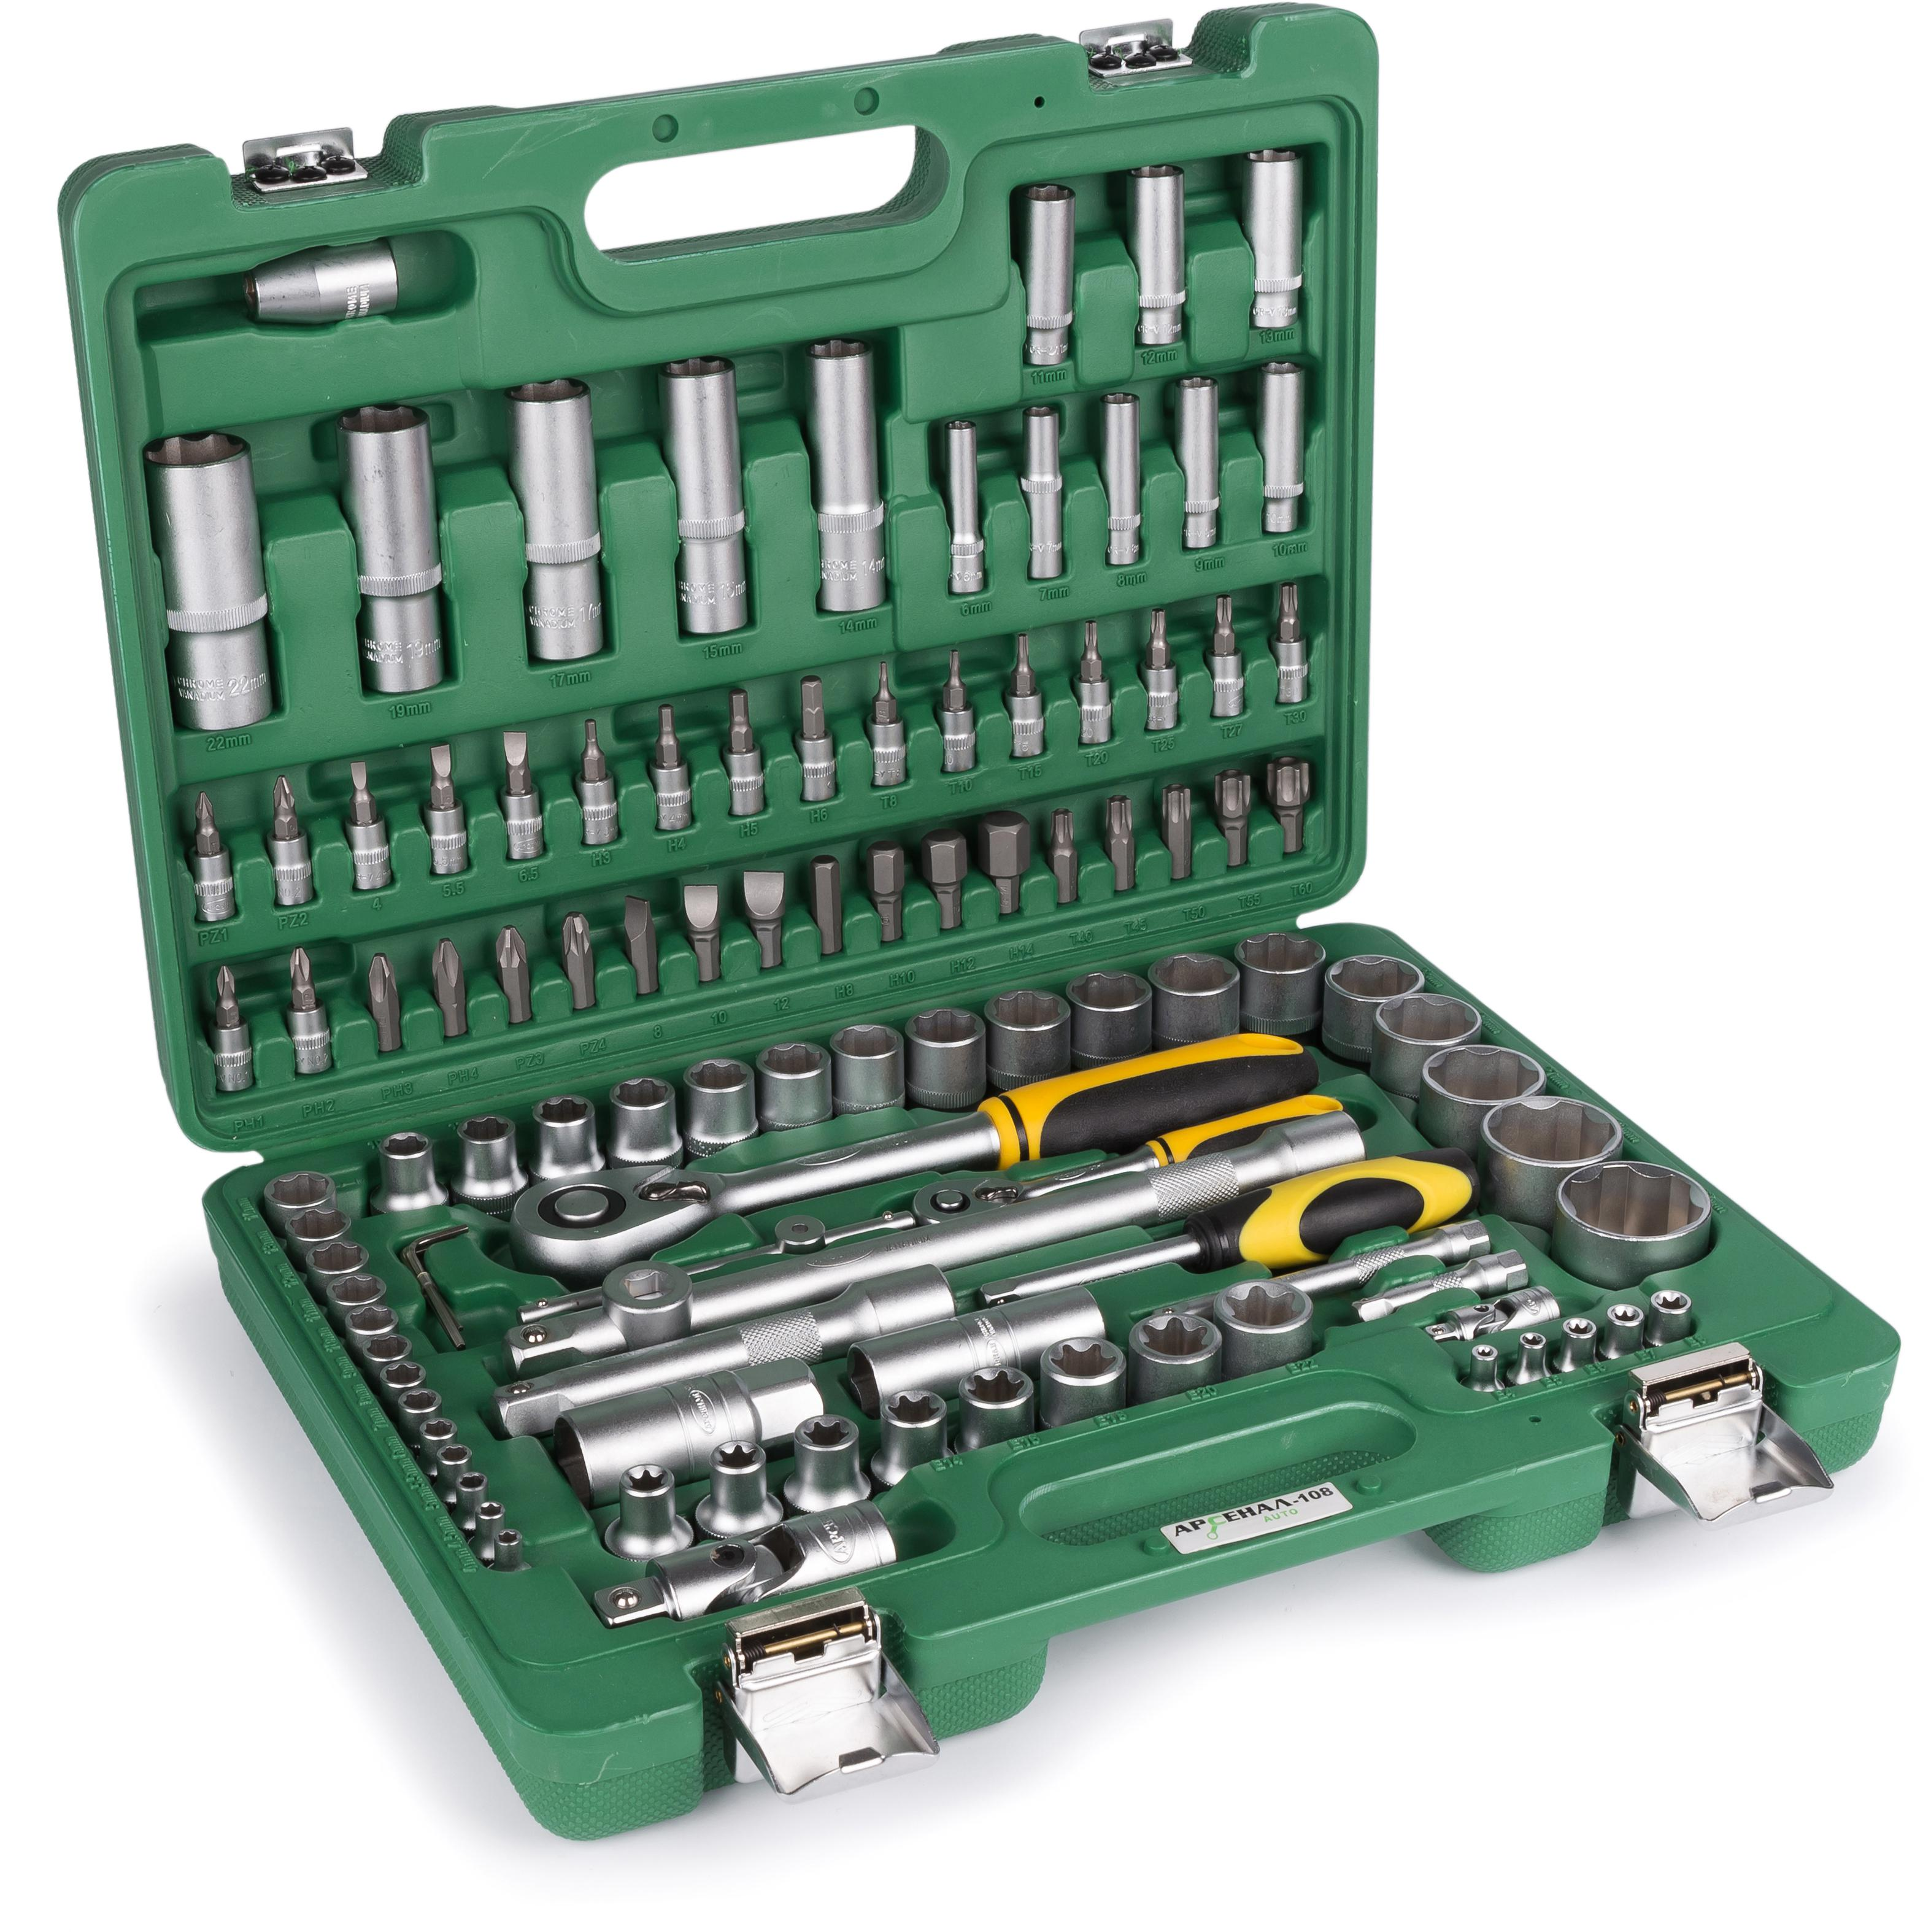 Набор инструментов АРСЕНАЛ Aa-c1412l108 набор инструмента арсенал aa c1412p94 для ваз